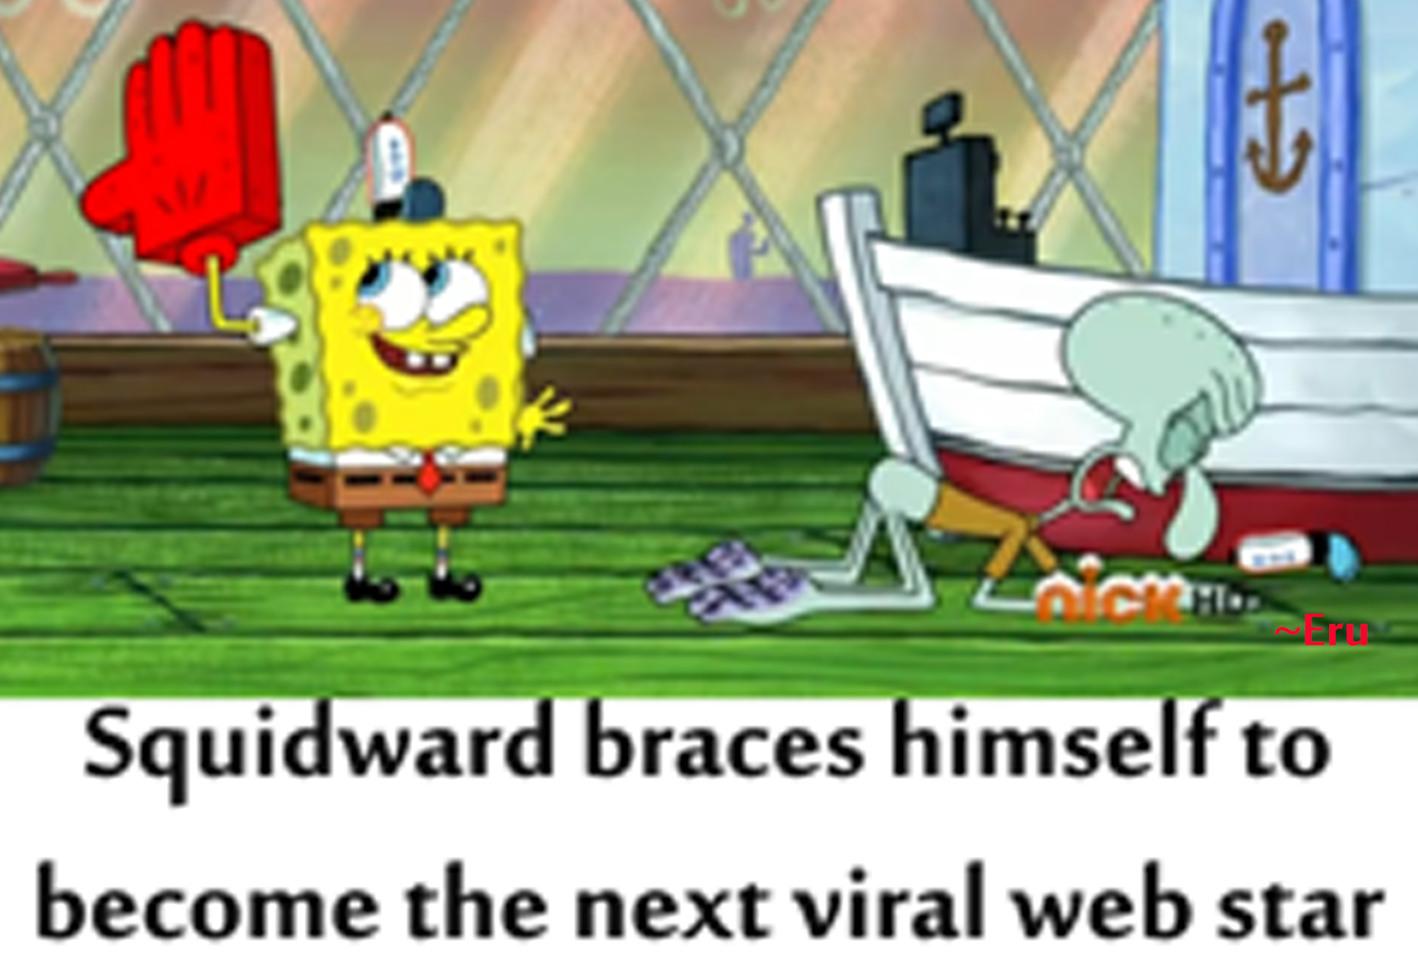 sponge caps 1 - meme